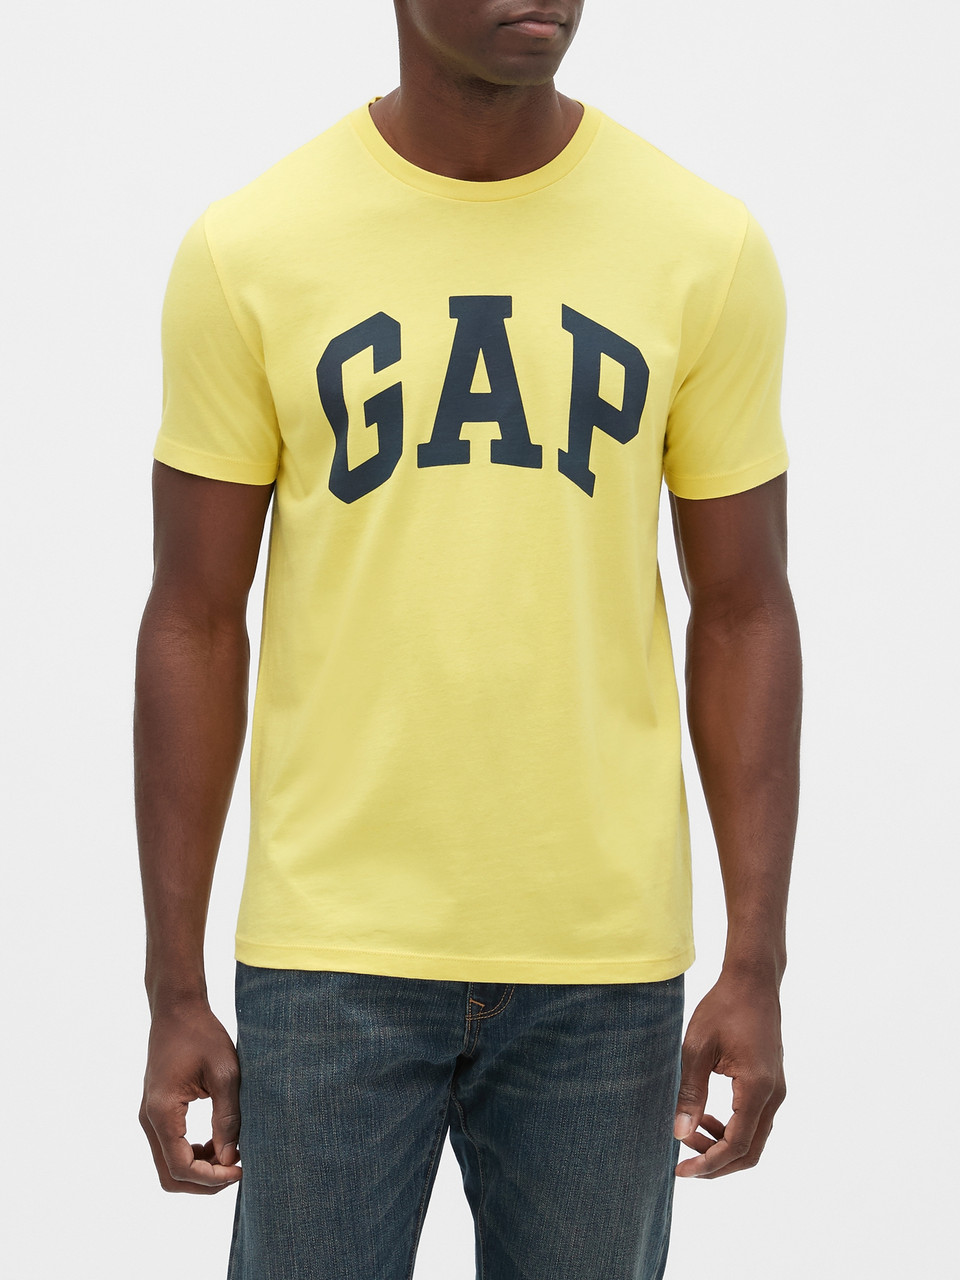 Футболка мужская GAP art547162 (Желтый, размер XS)